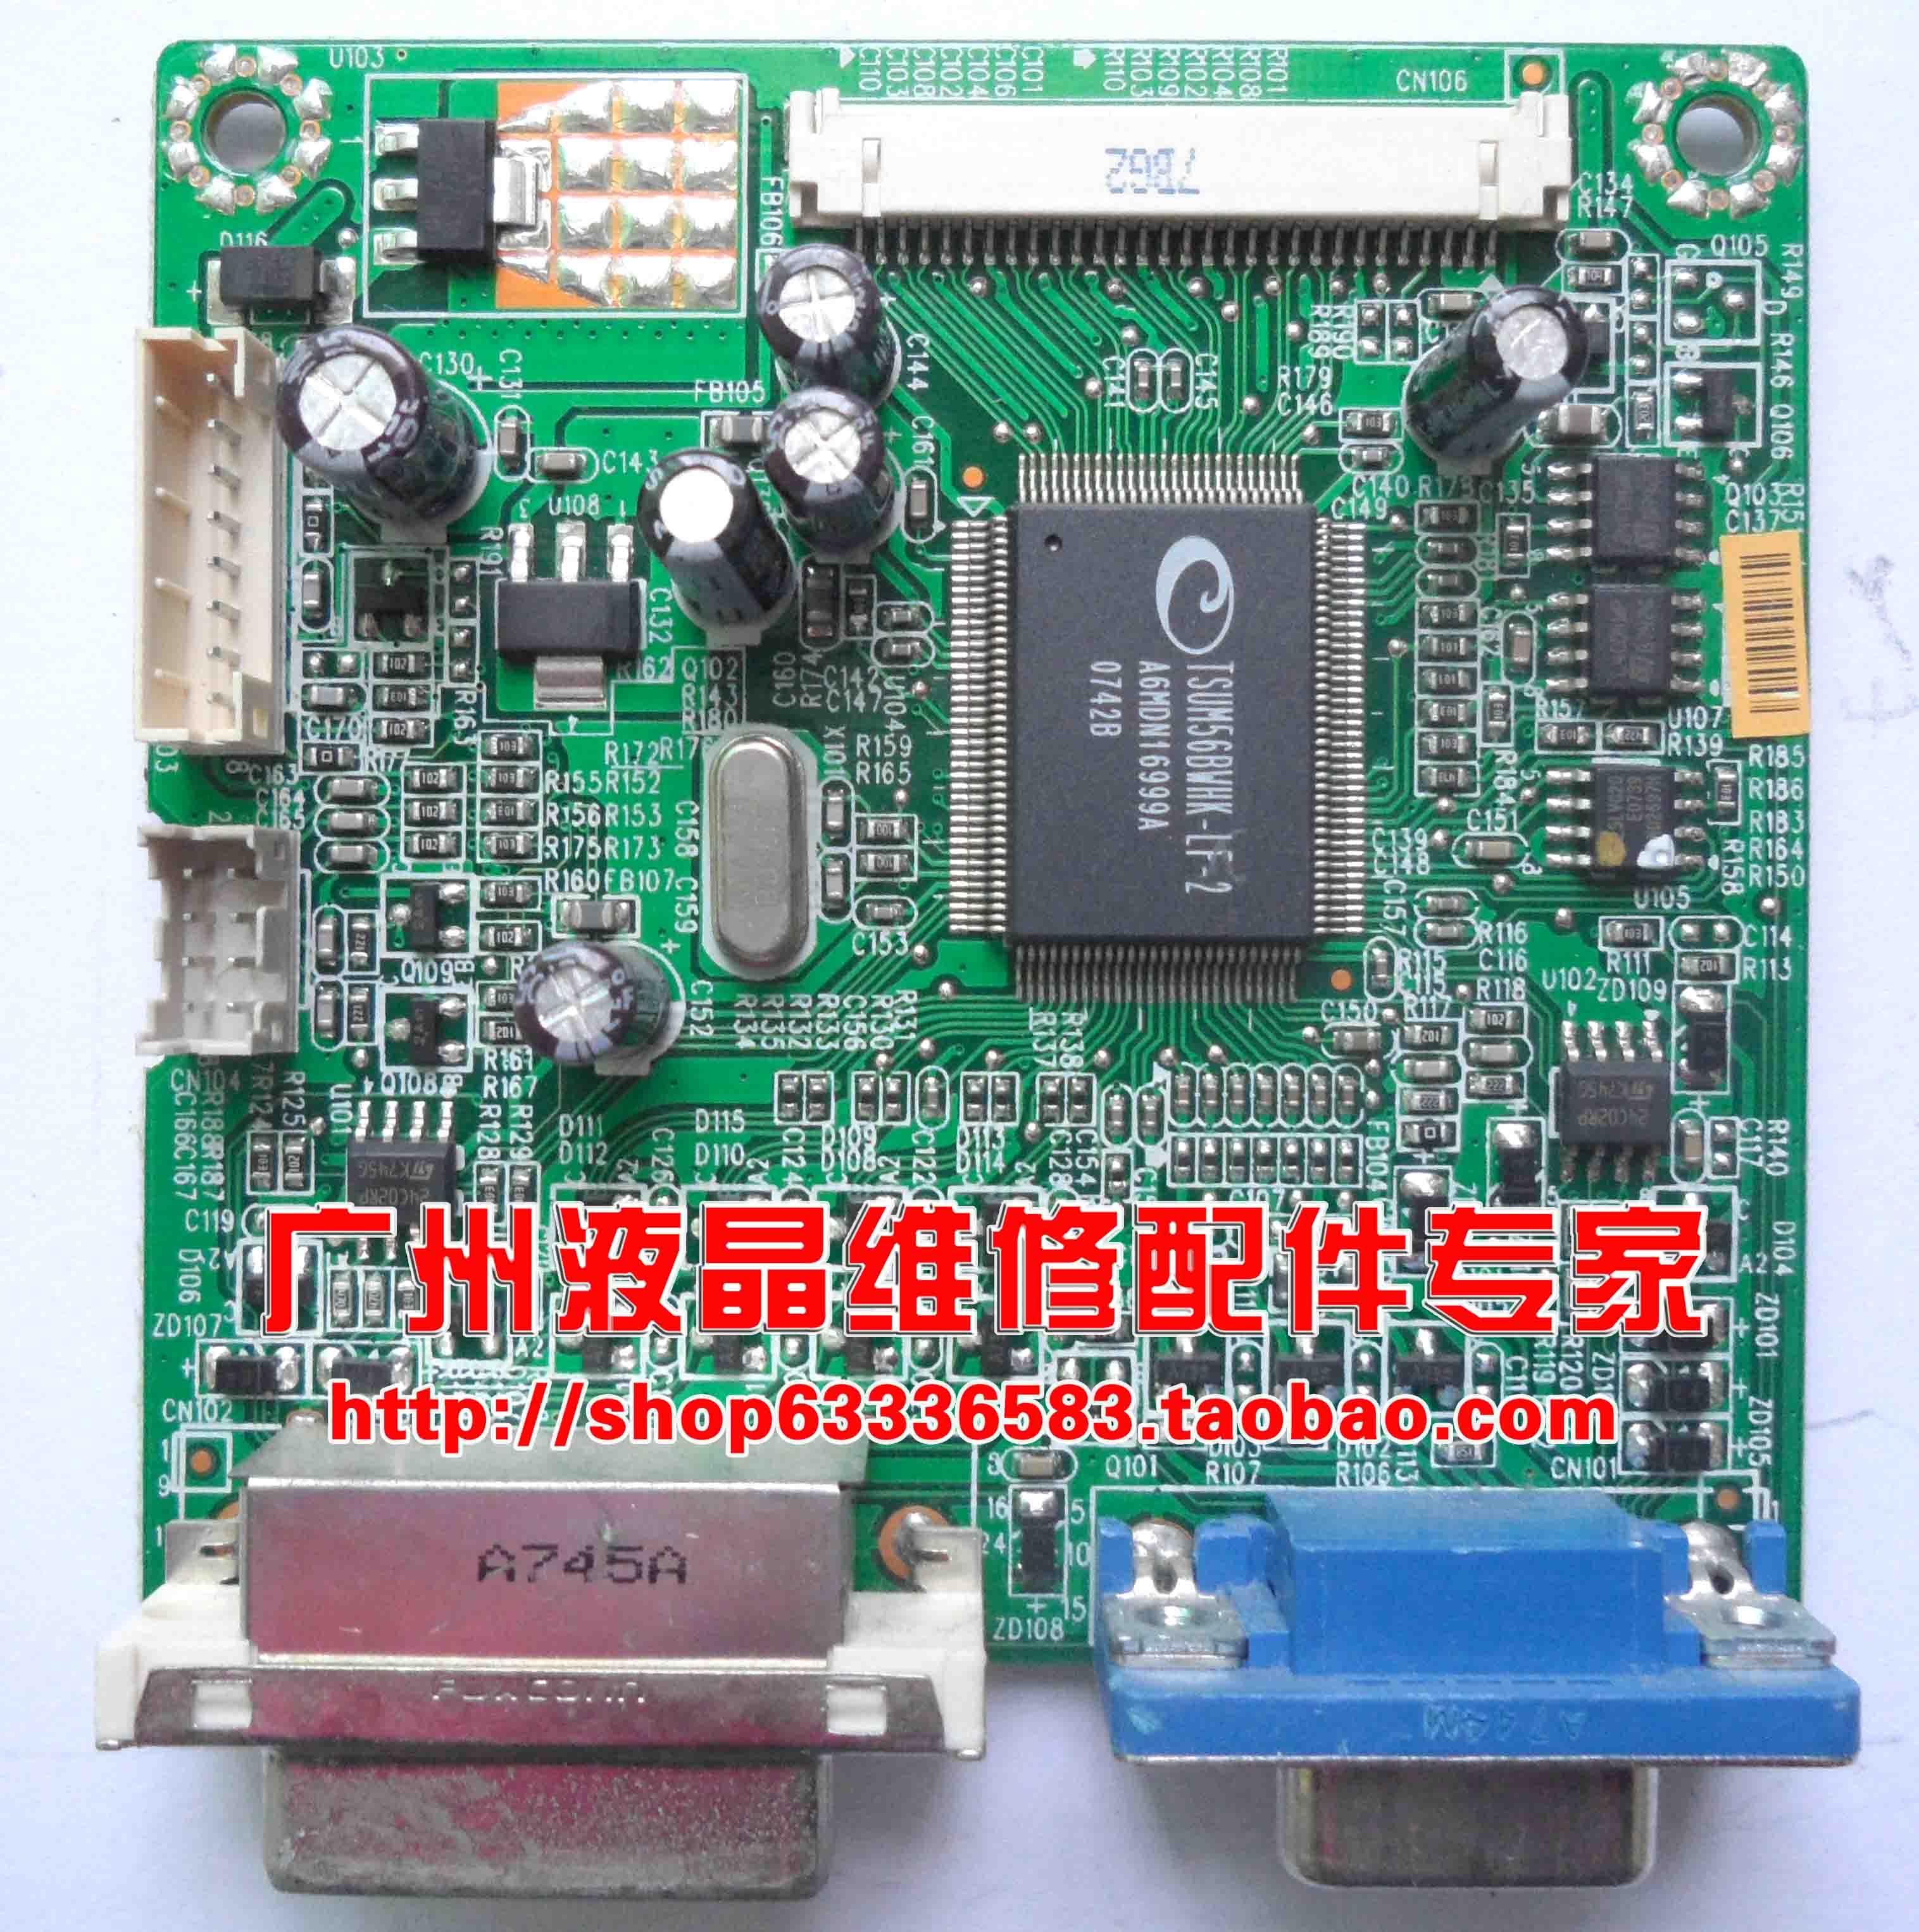 Free Shipping>Original 100% Tested Working  E198WFPF S199WFP ILIF-027 490941300000R motherboard driver board l175d l174d driver board 491641300100r ilif 092 signal board used disassemble